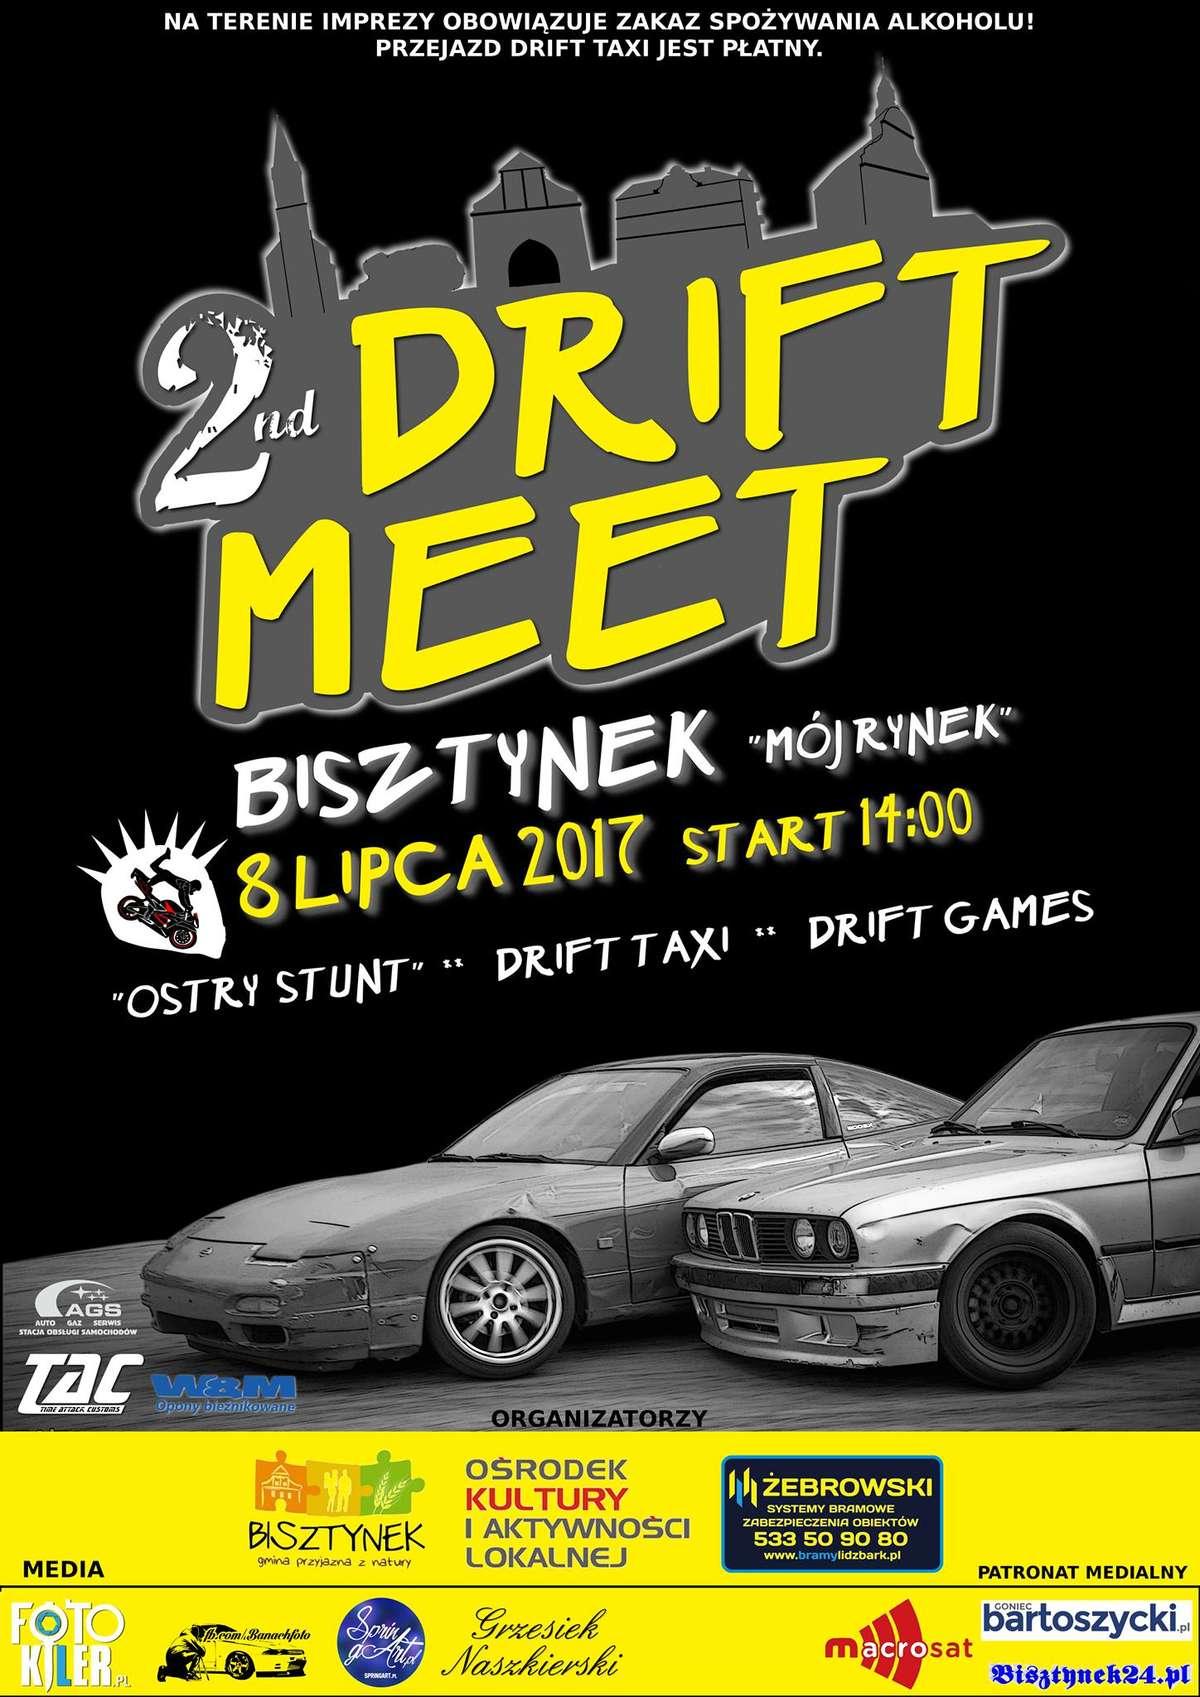 Drugi Drift Meet w Bisztynku - full image